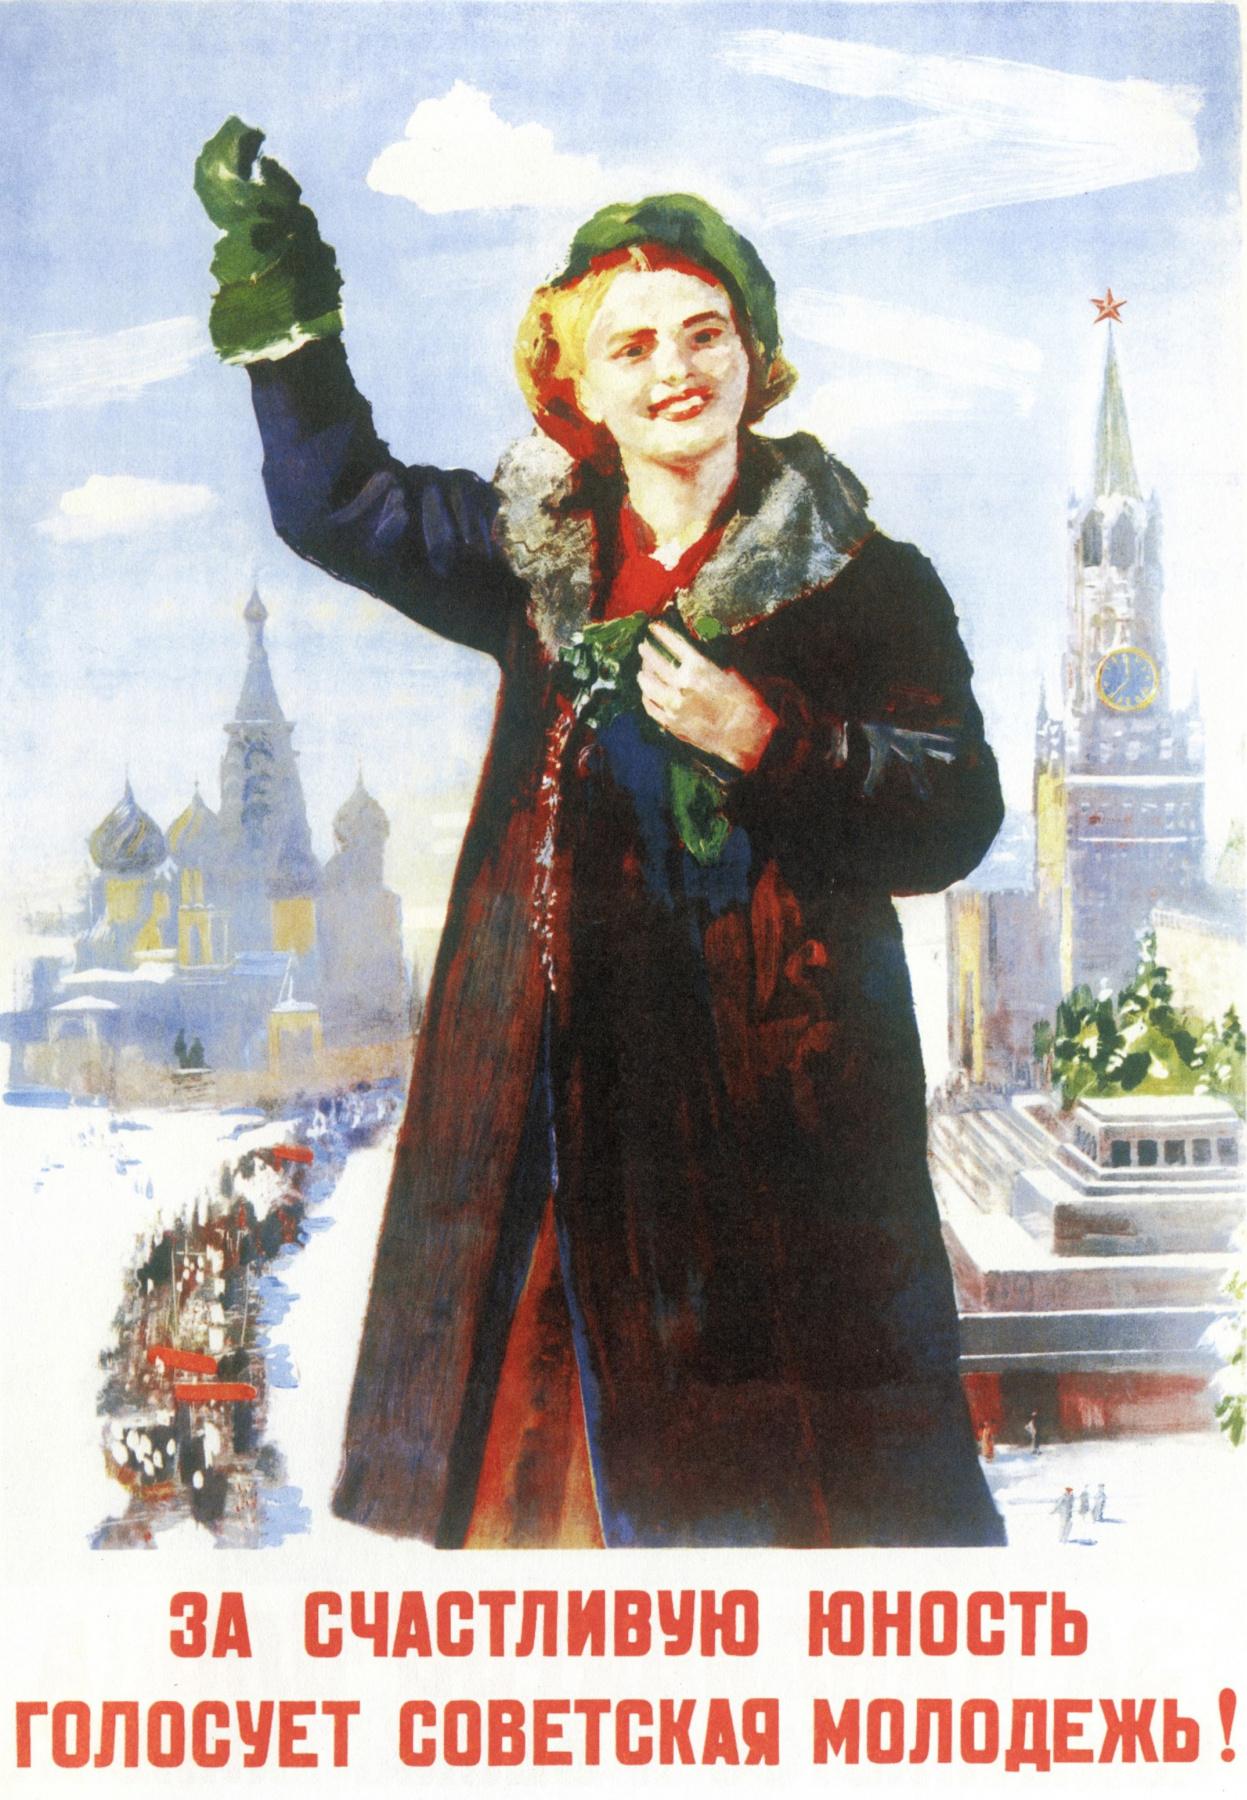 Boris Vladimirovich Ioganson. For a happy youth vote Soviet youth!